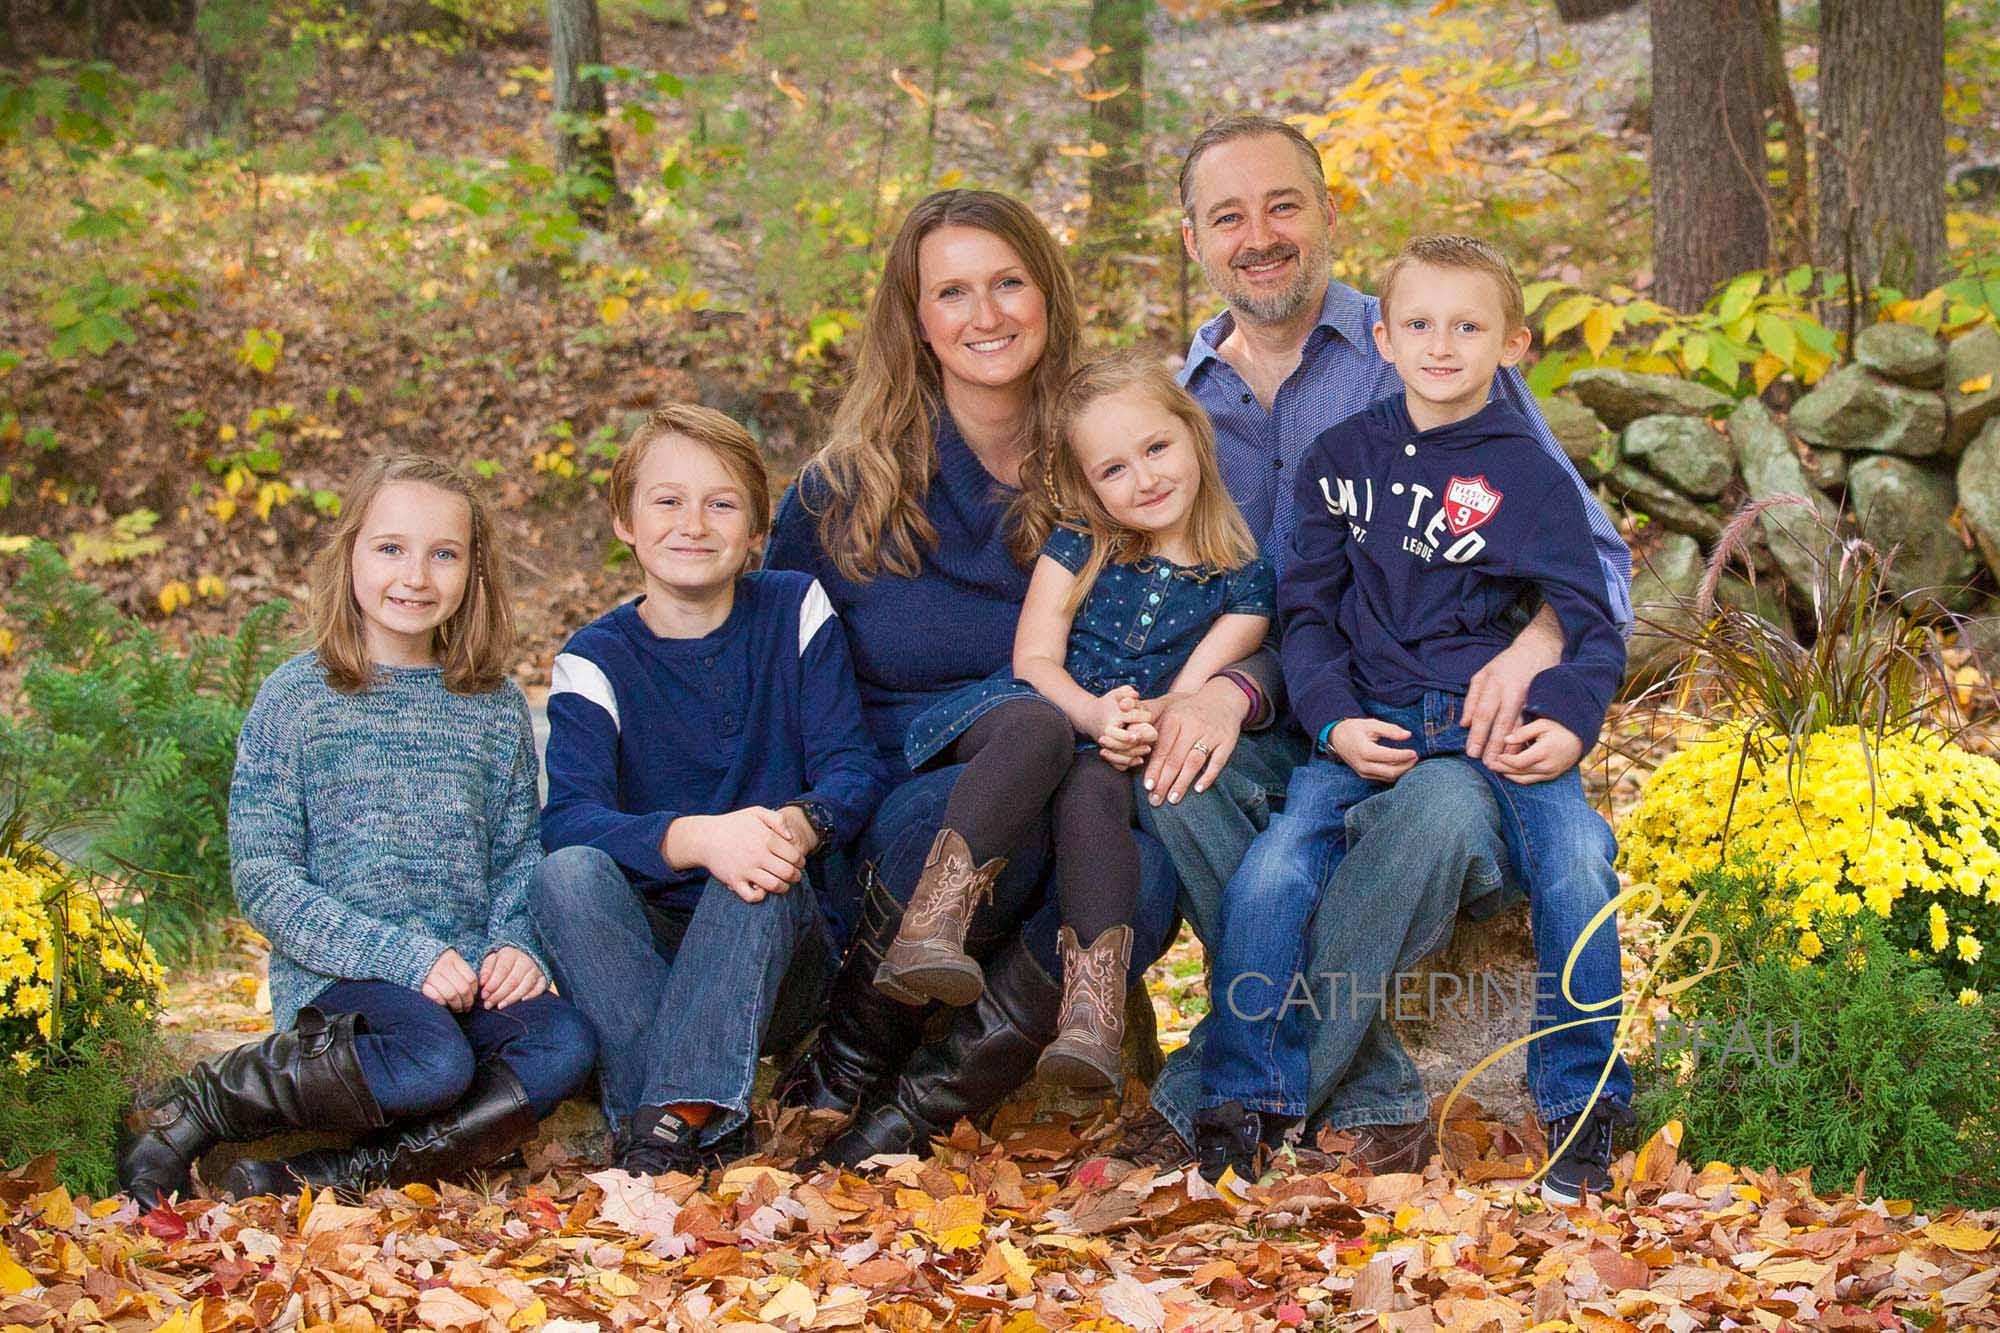 catherinepfauphotography_familyportrait_children_photography-8.jpg